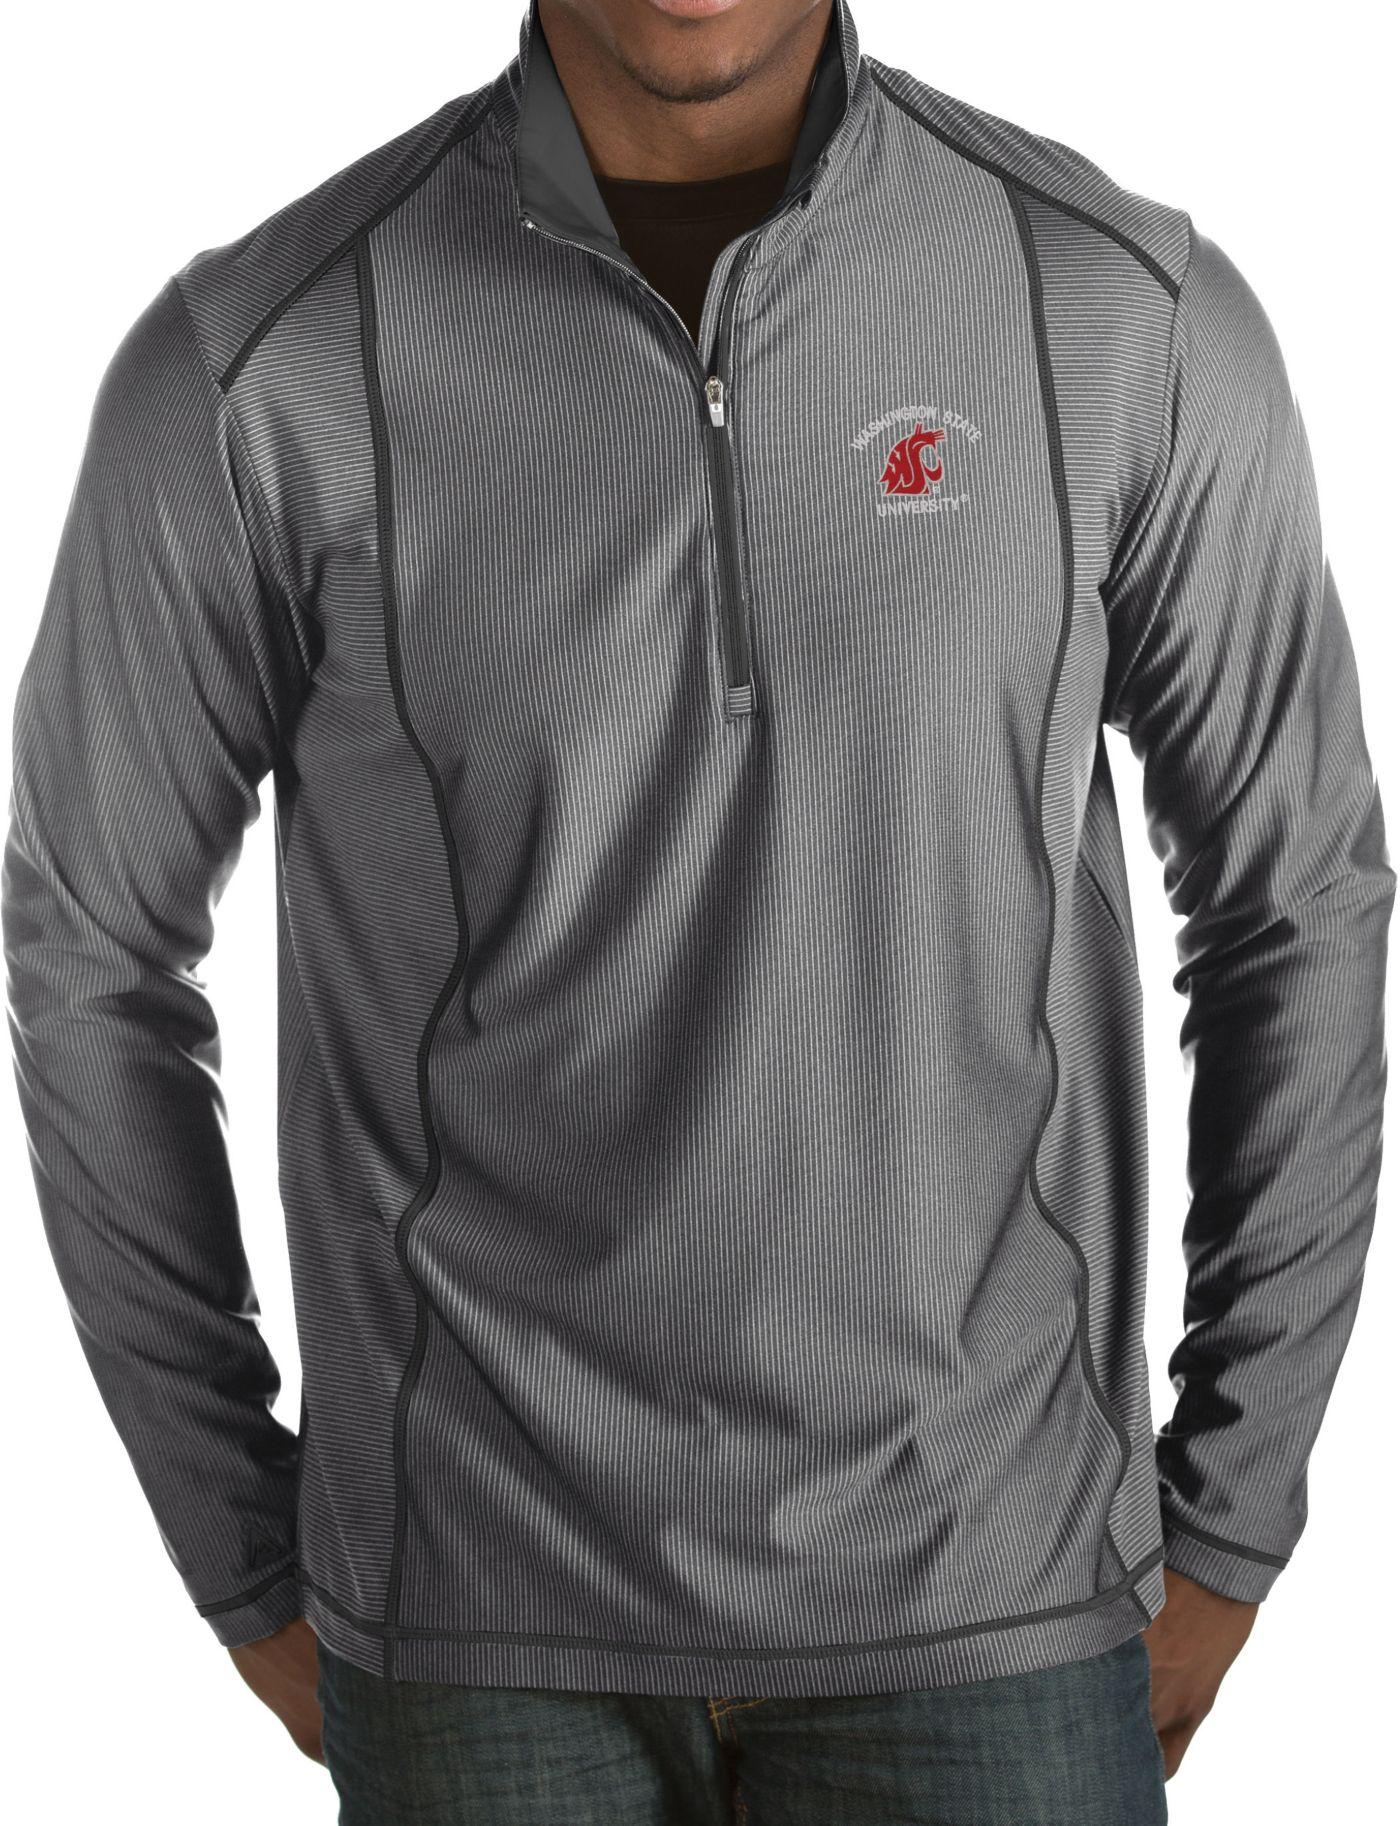 Antigua Men's Washington State Cougars Grey Tempo Half-Zip Pullover